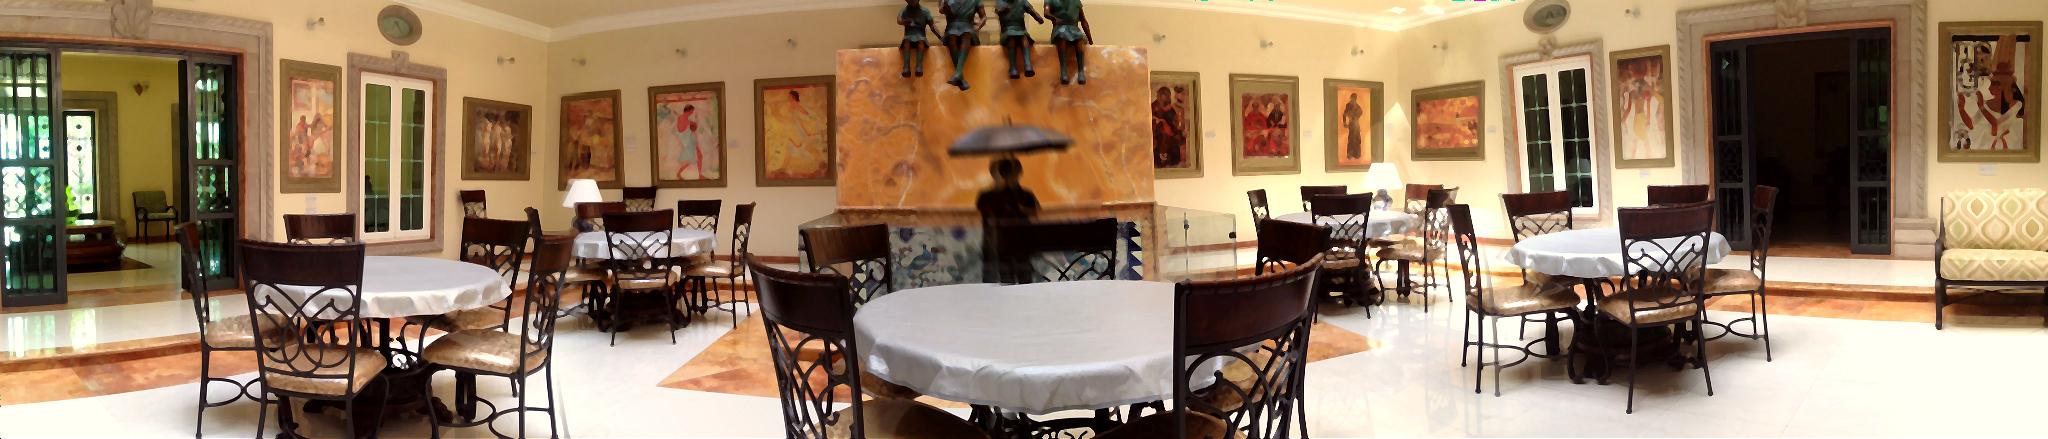 Comedor torre principal villa toscana 8.jpg